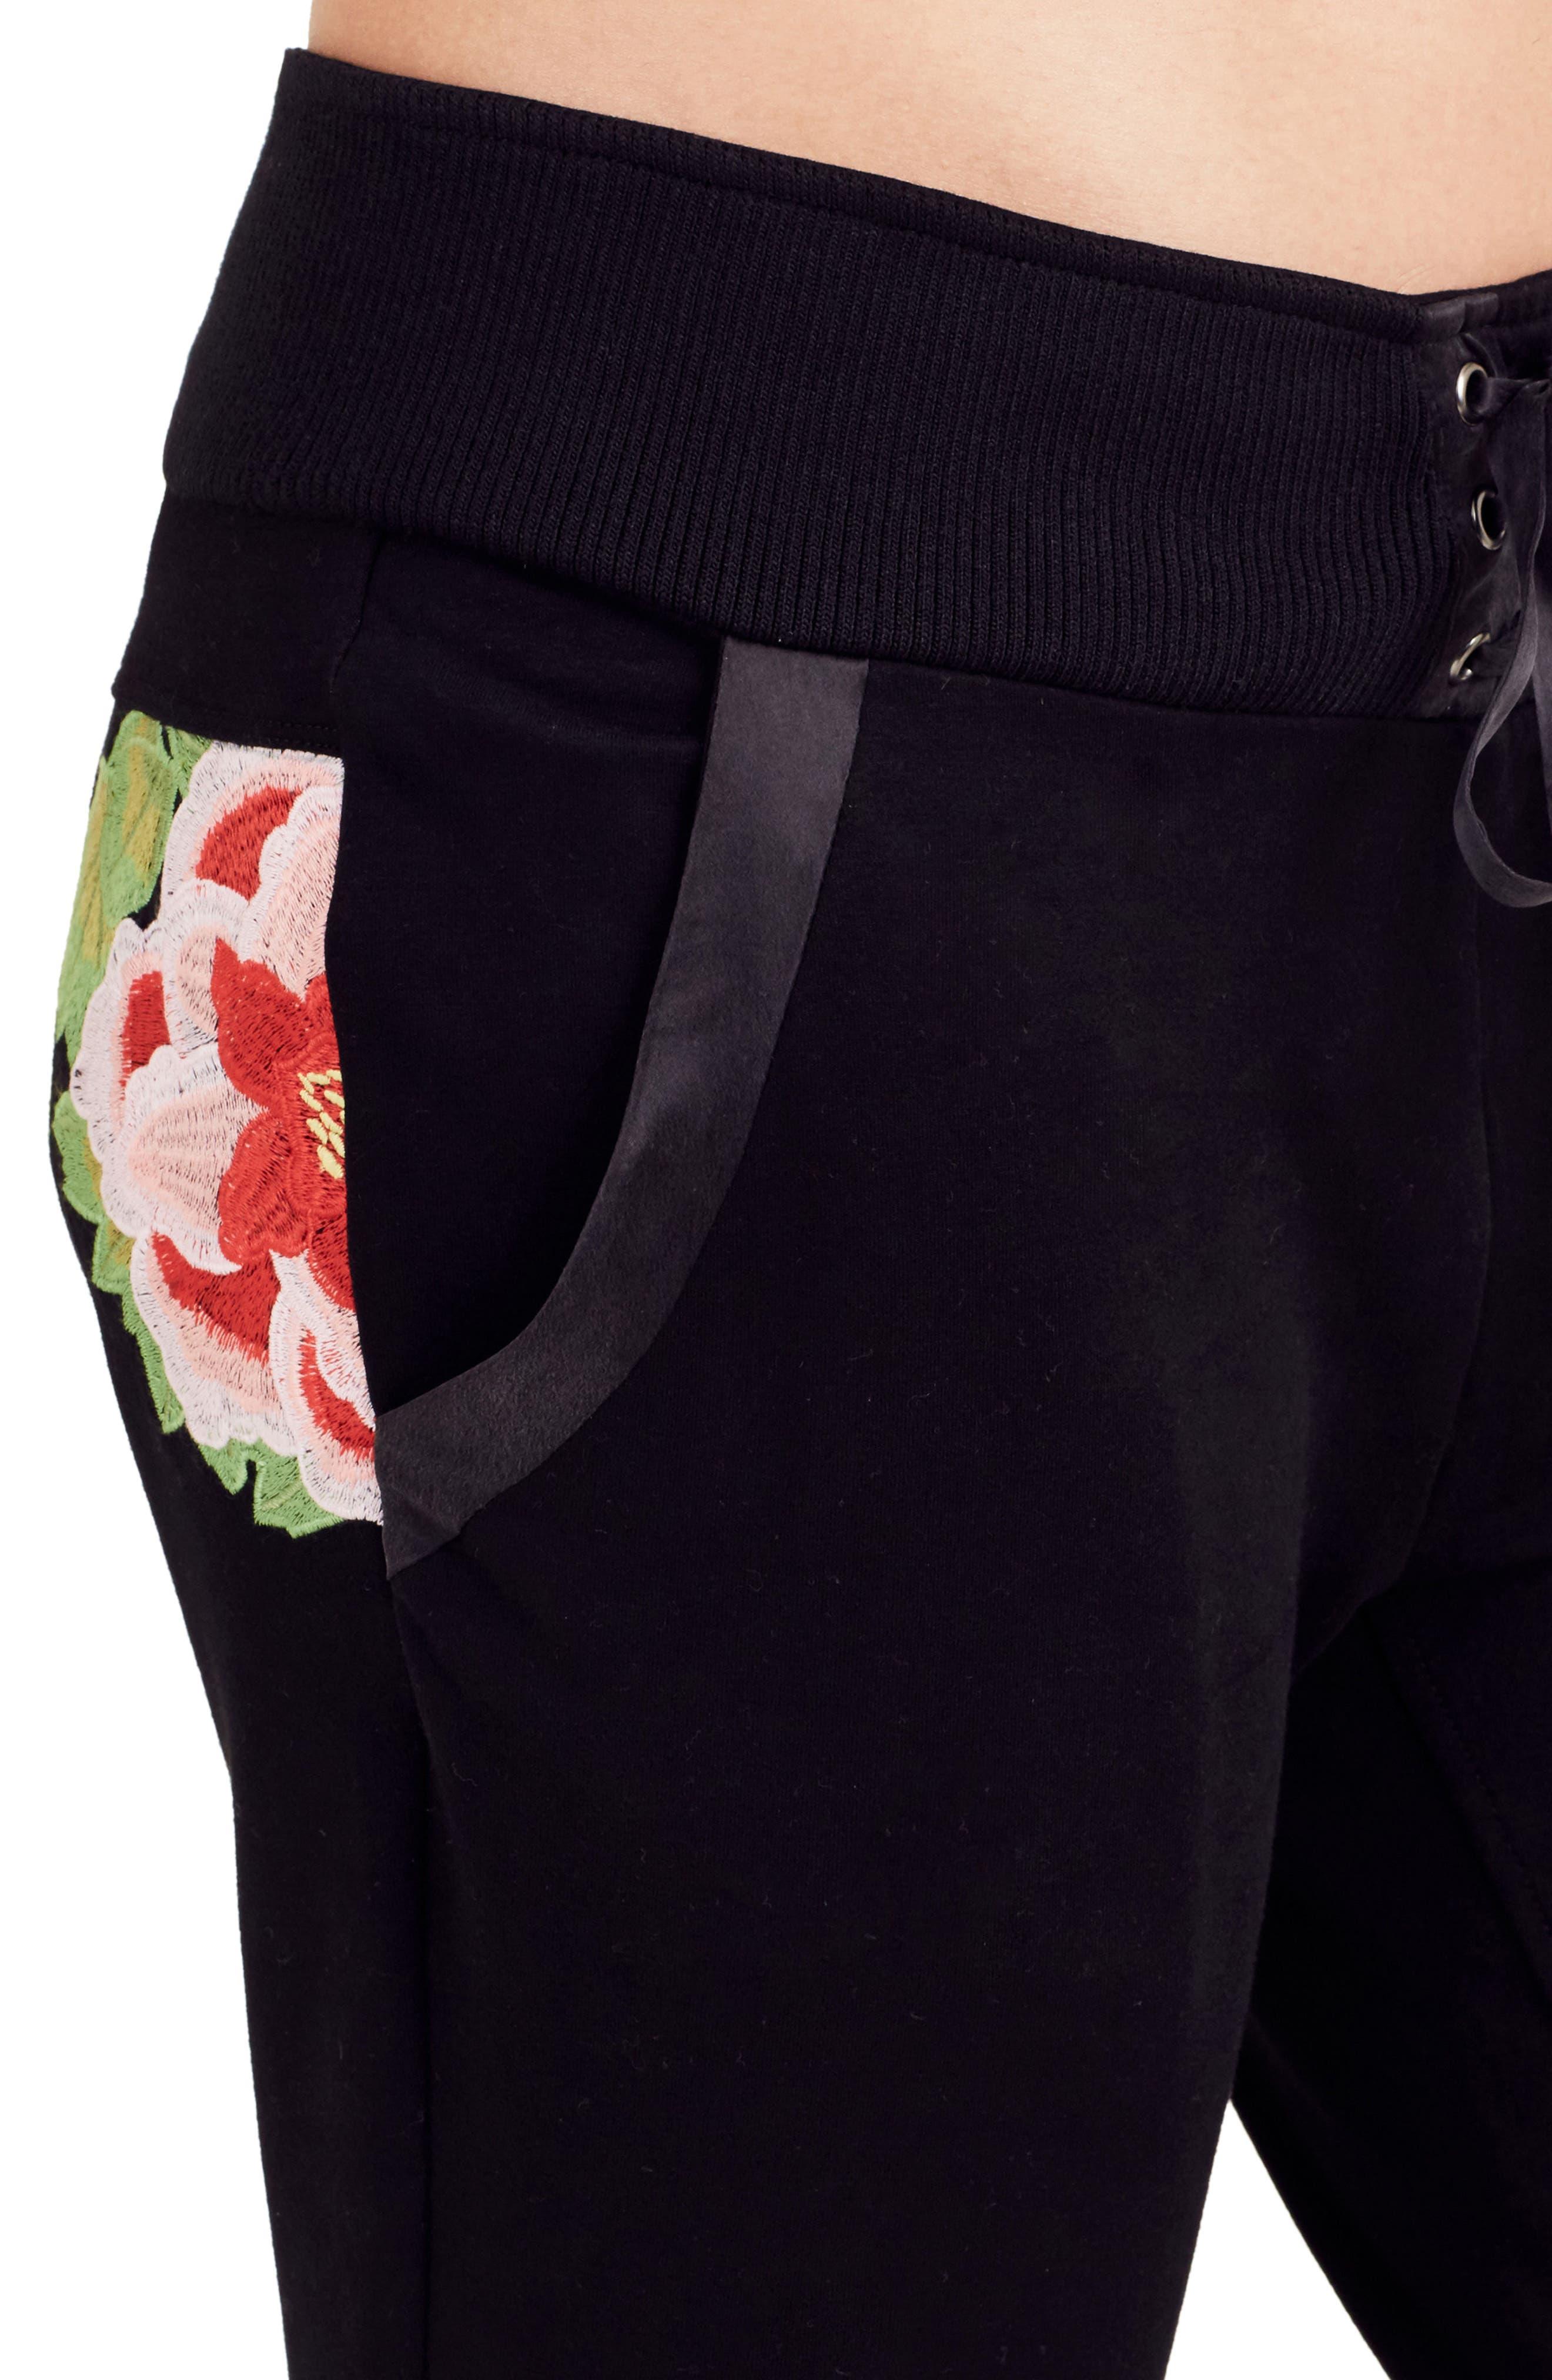 Embroidered Jogger Pants,                             Alternate thumbnail 4, color,                             Black